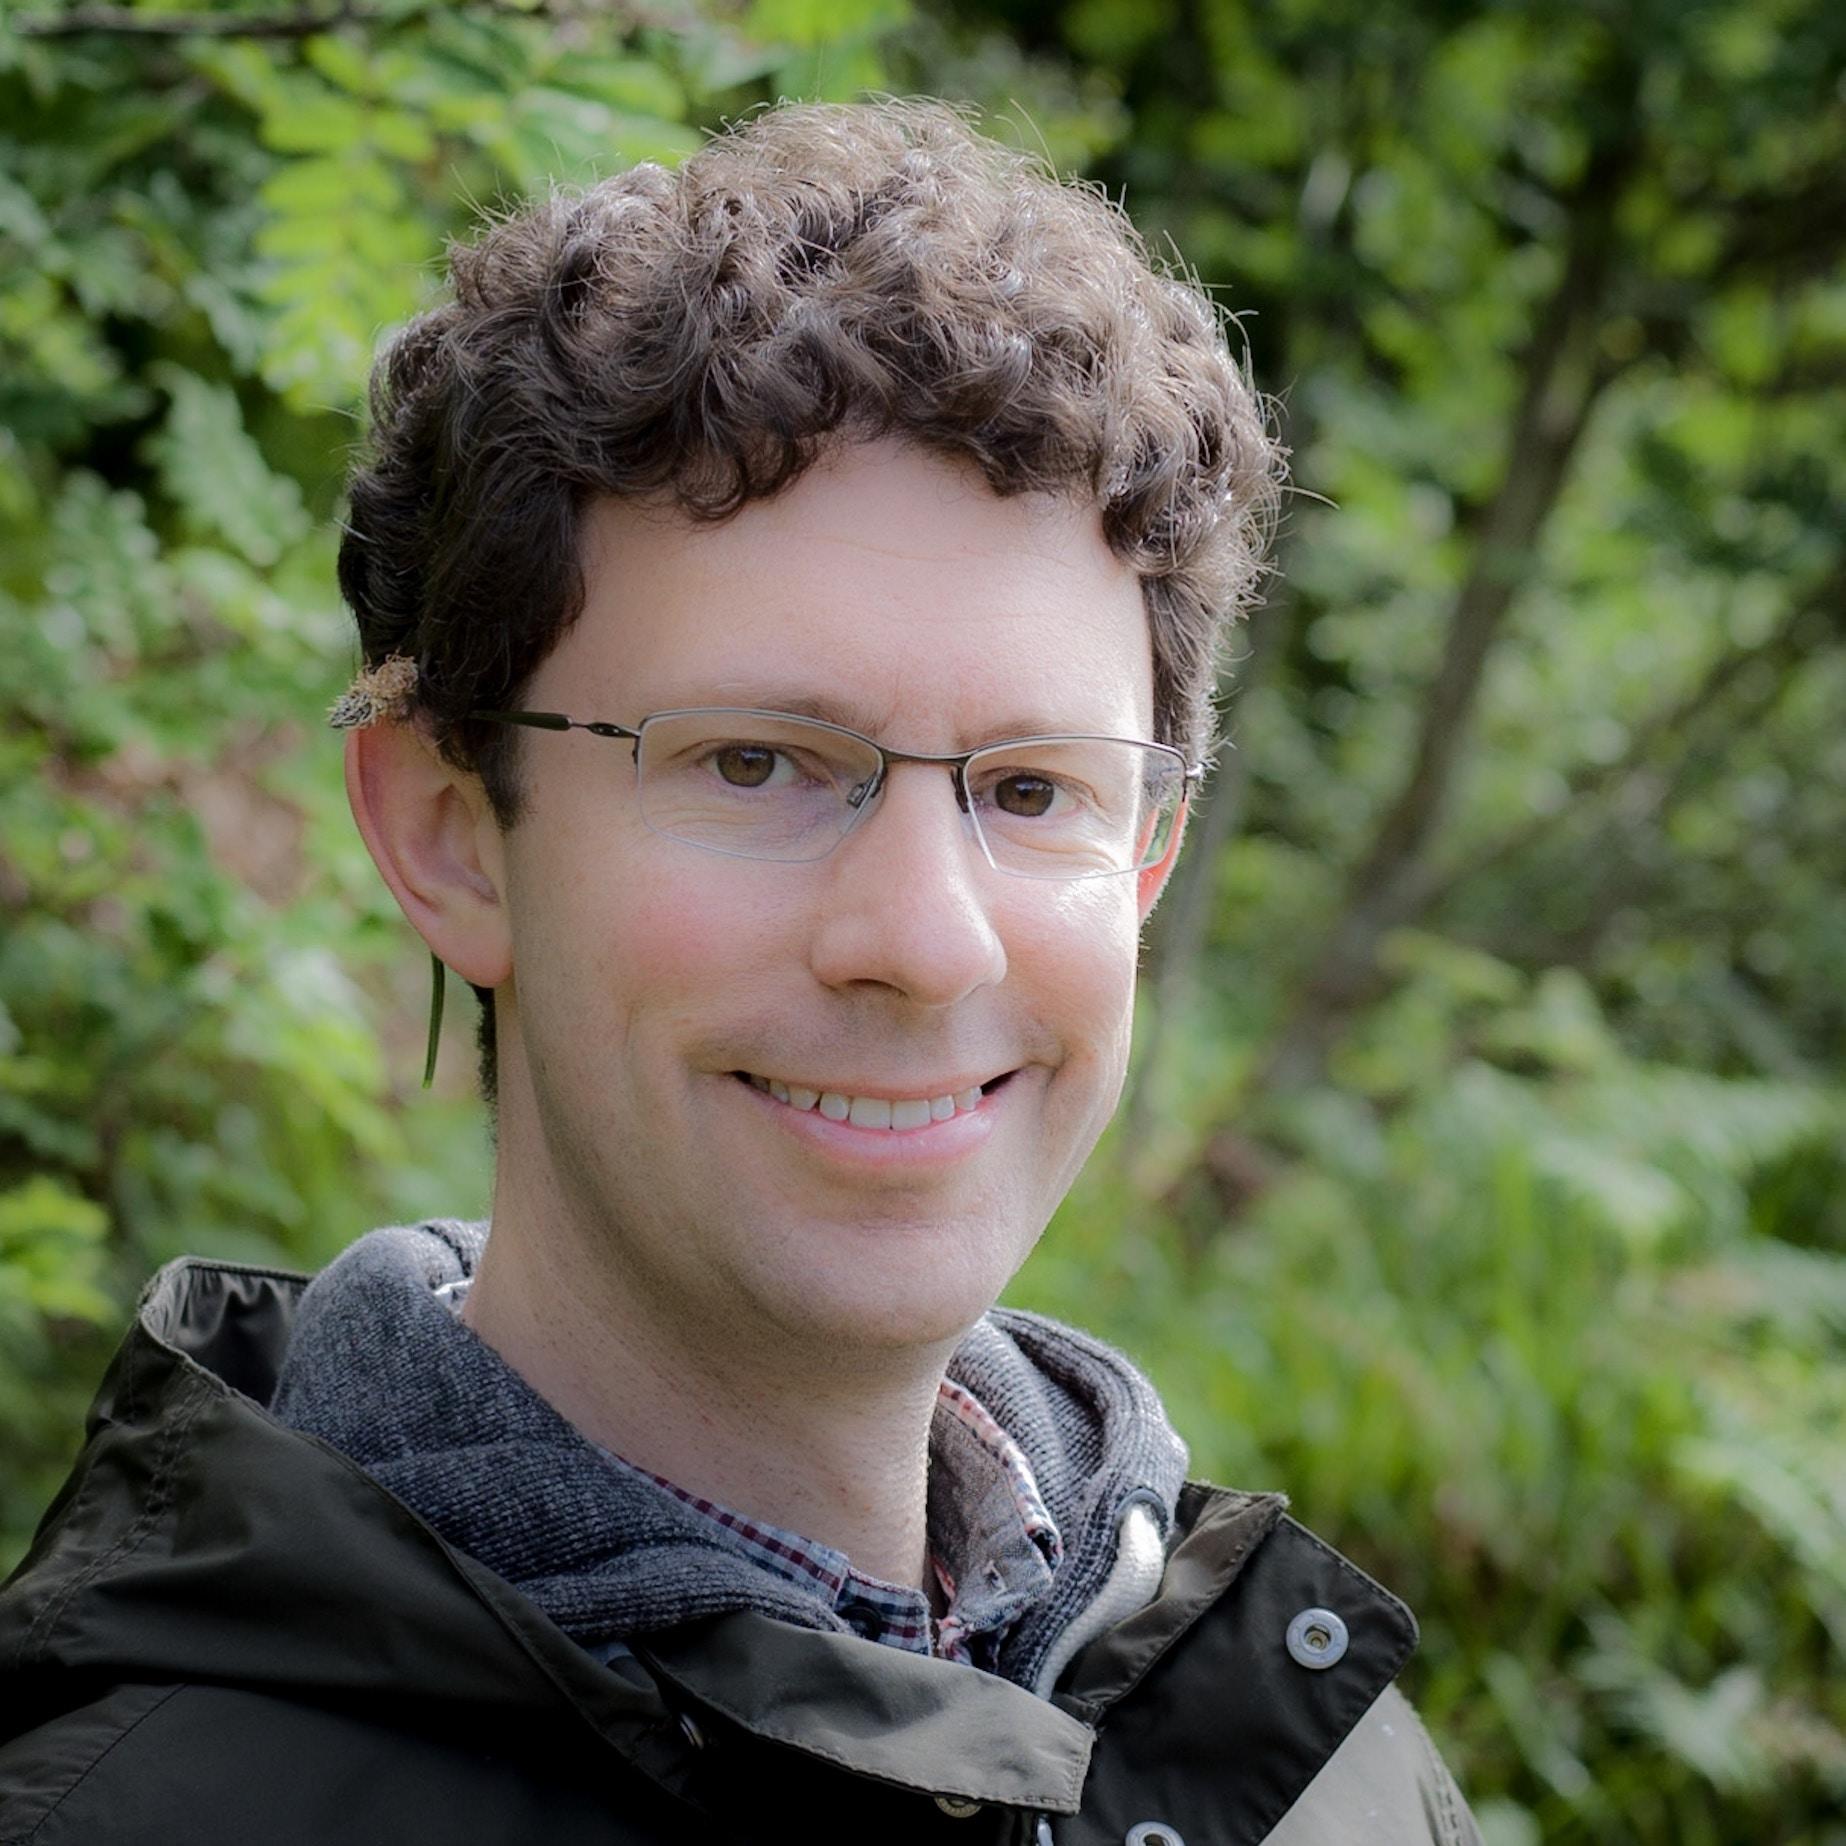 Avatar of user Alan Godfrey